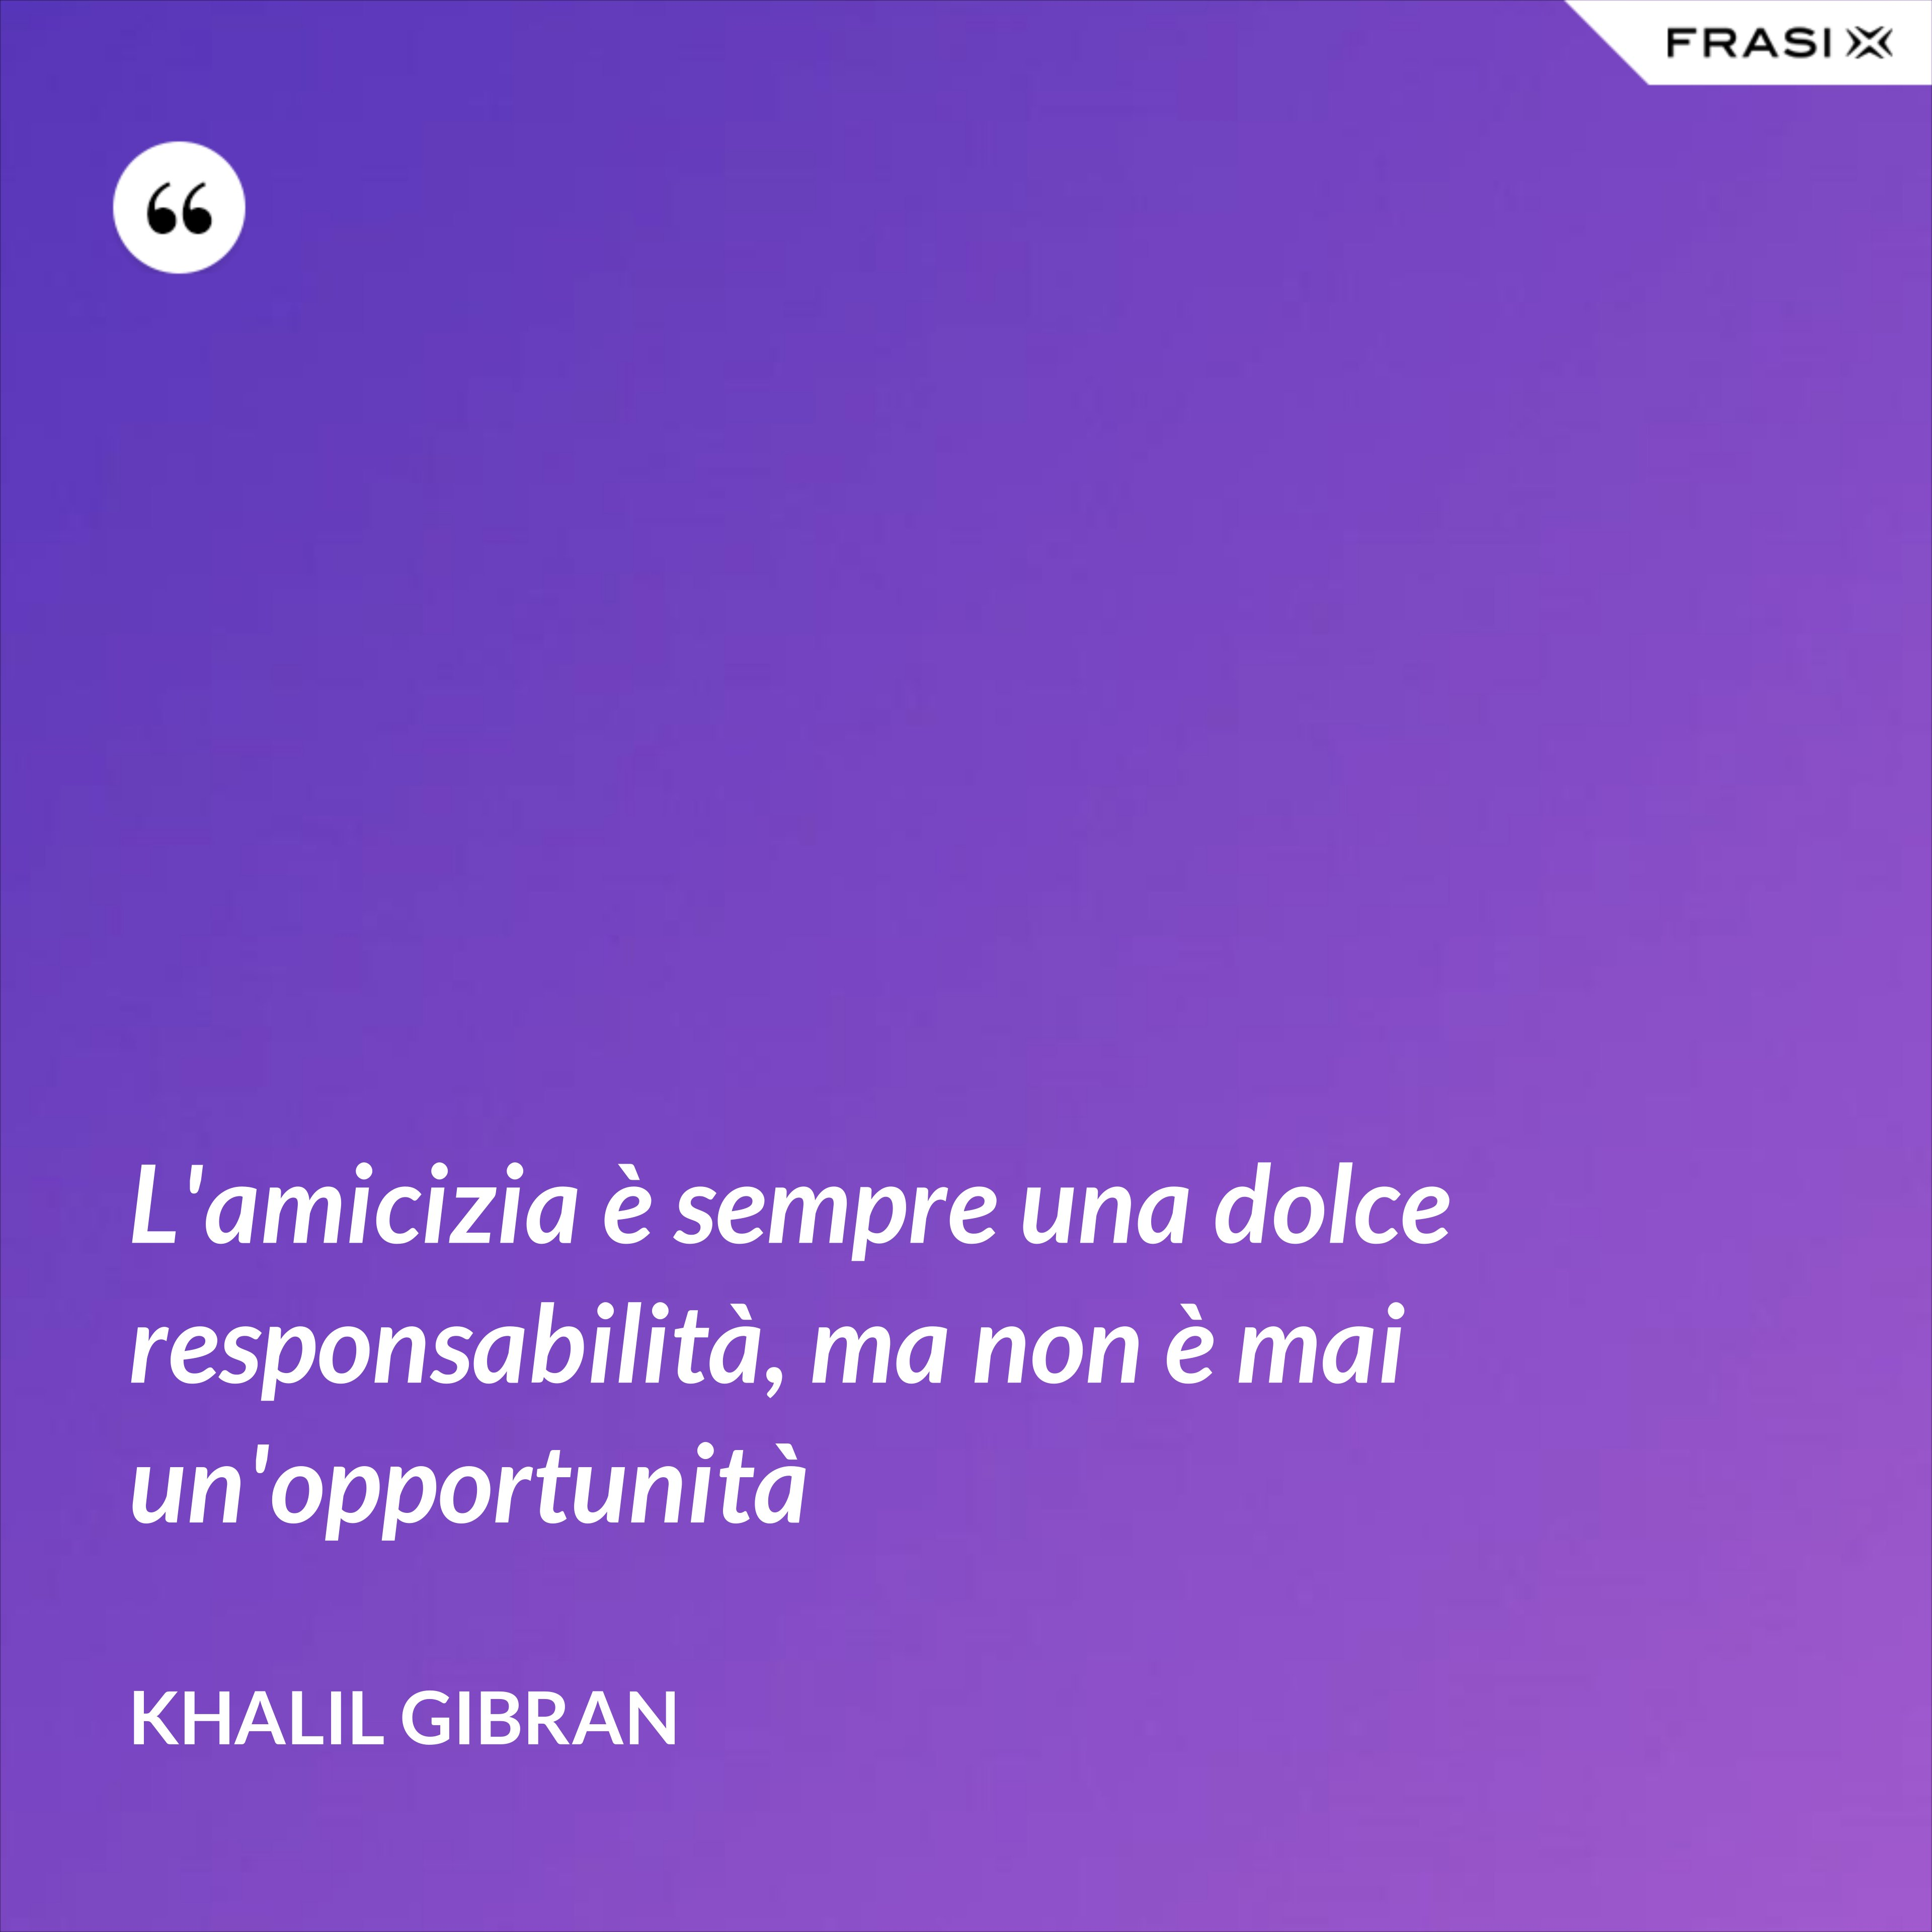 L'amicizia è sempre una dolce responsabilità, ma non è mai un'opportunità - Khalil Gibran